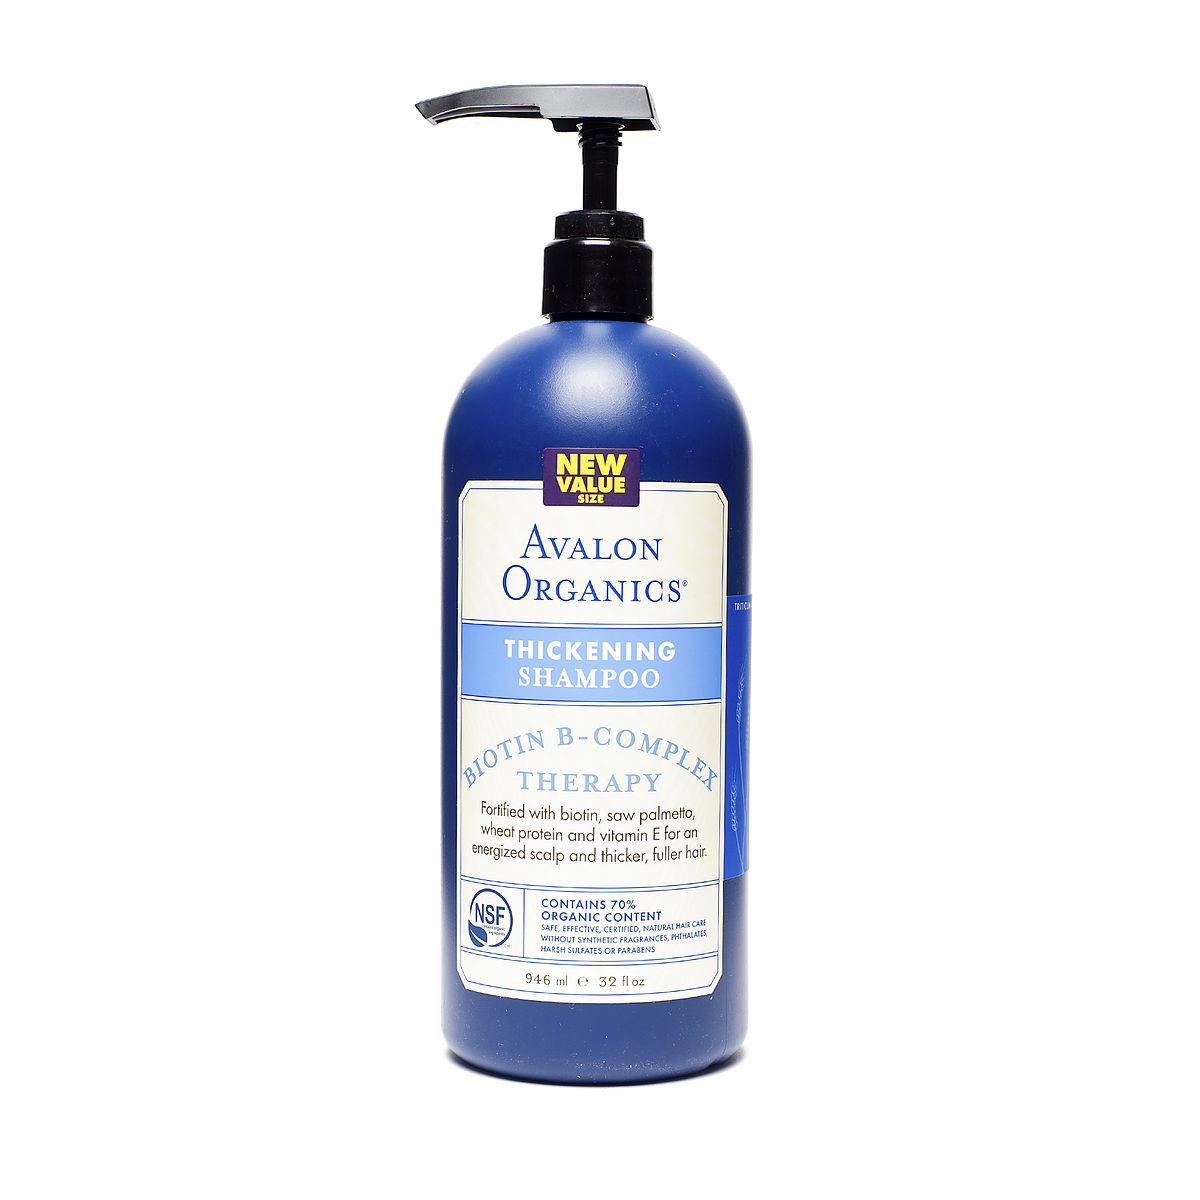 Thickening shampoo that works